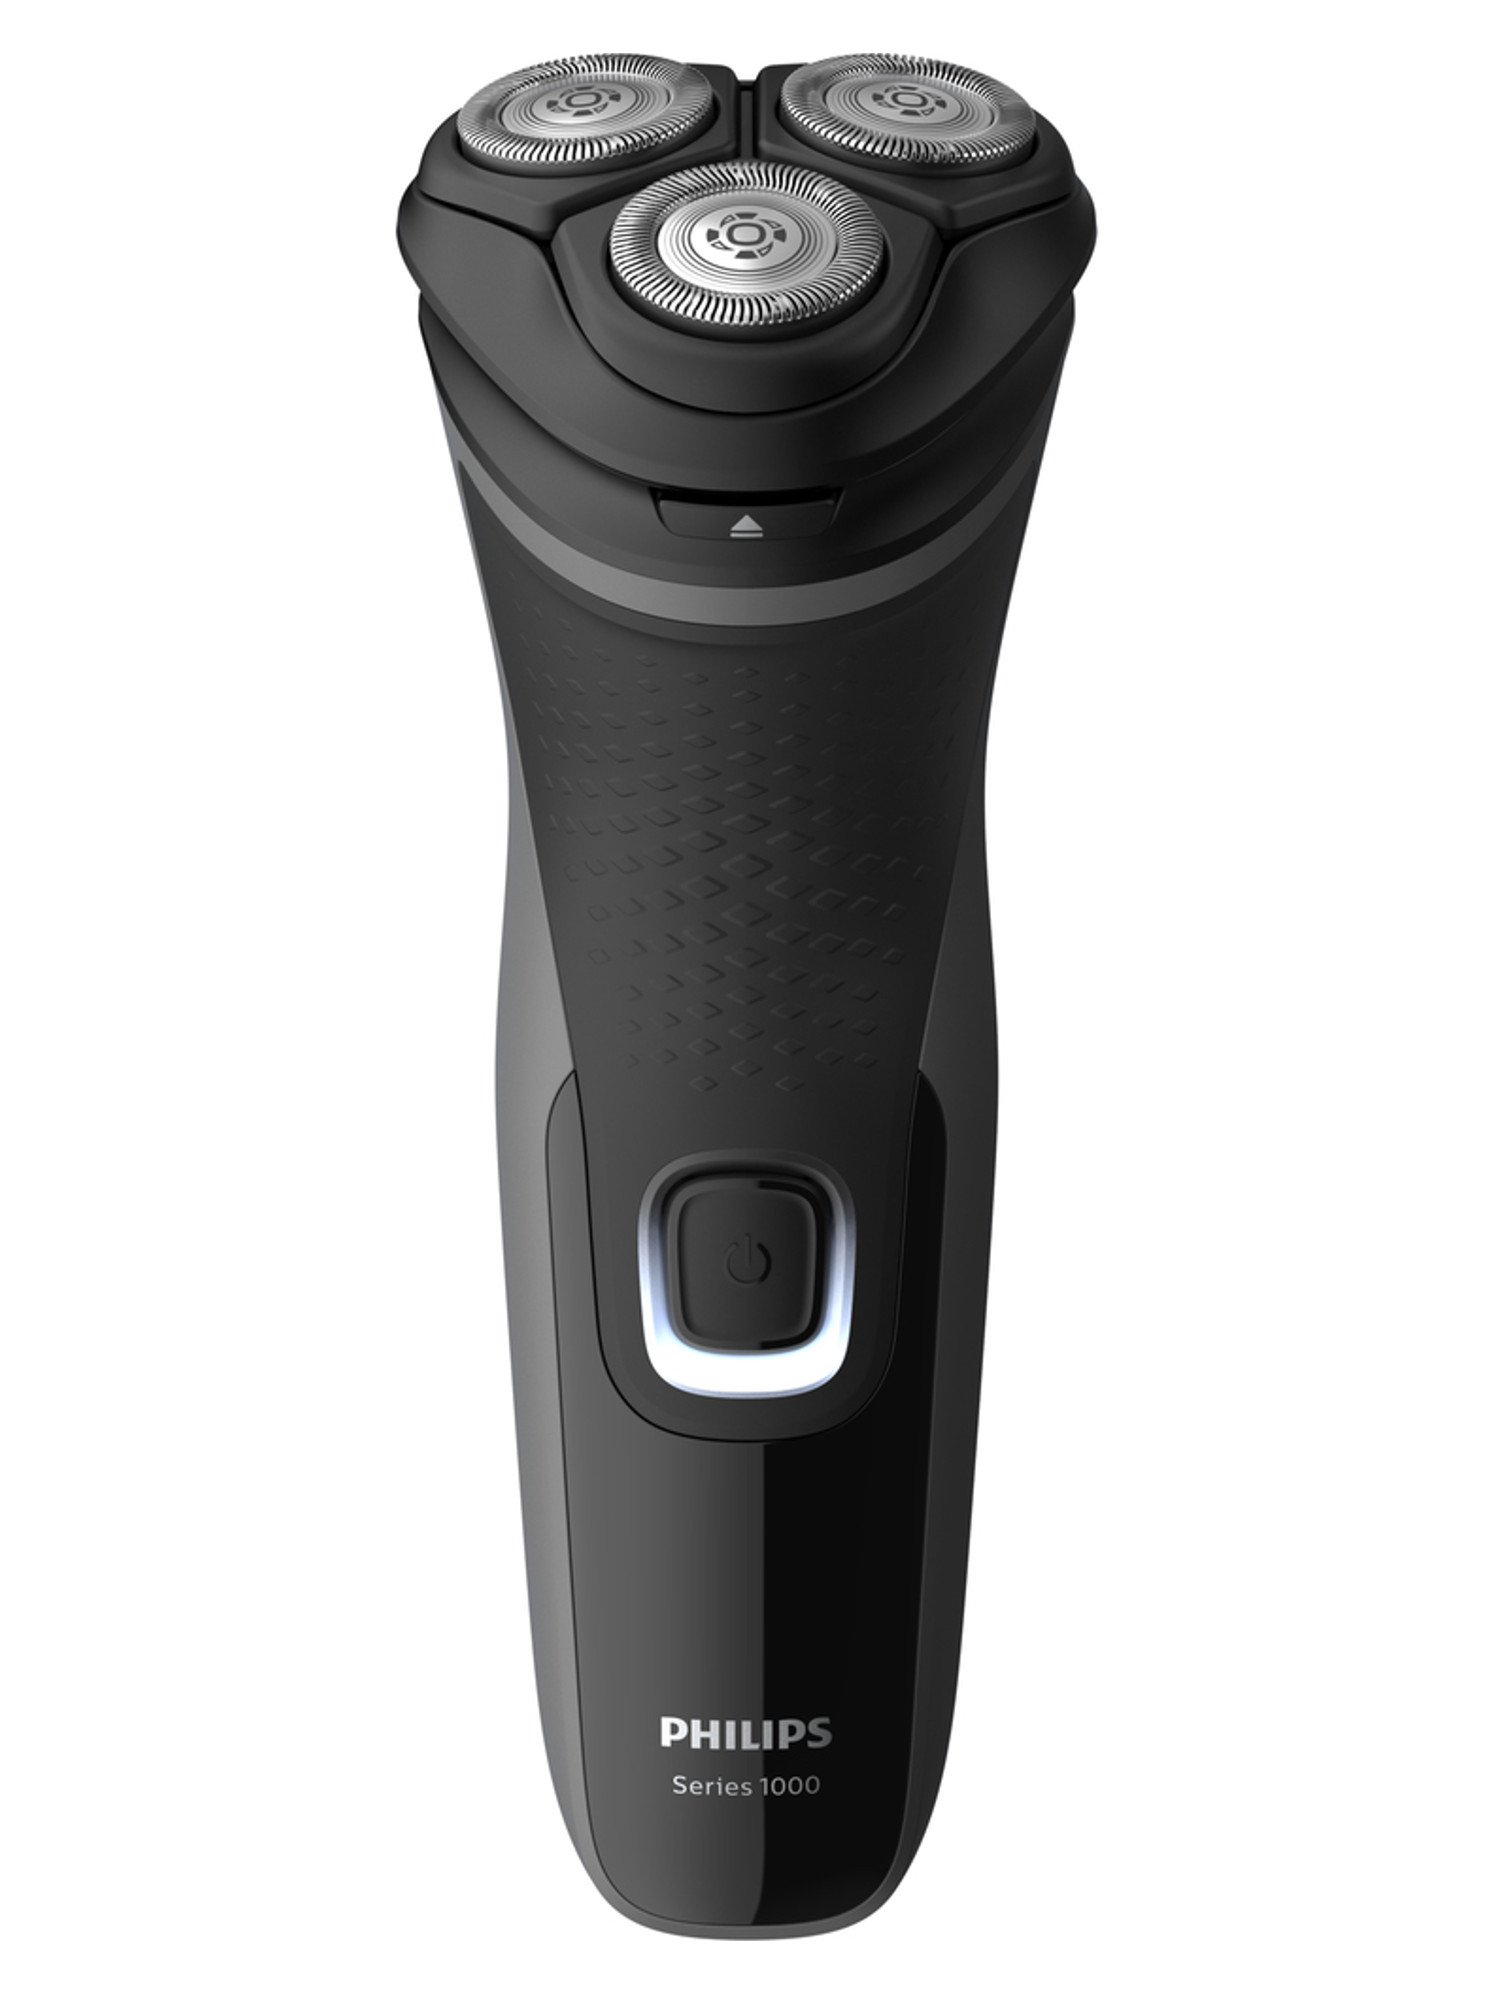 Holicí strojek Philips Shaver 1000 S1231/41 + DÁREK ZDARMA